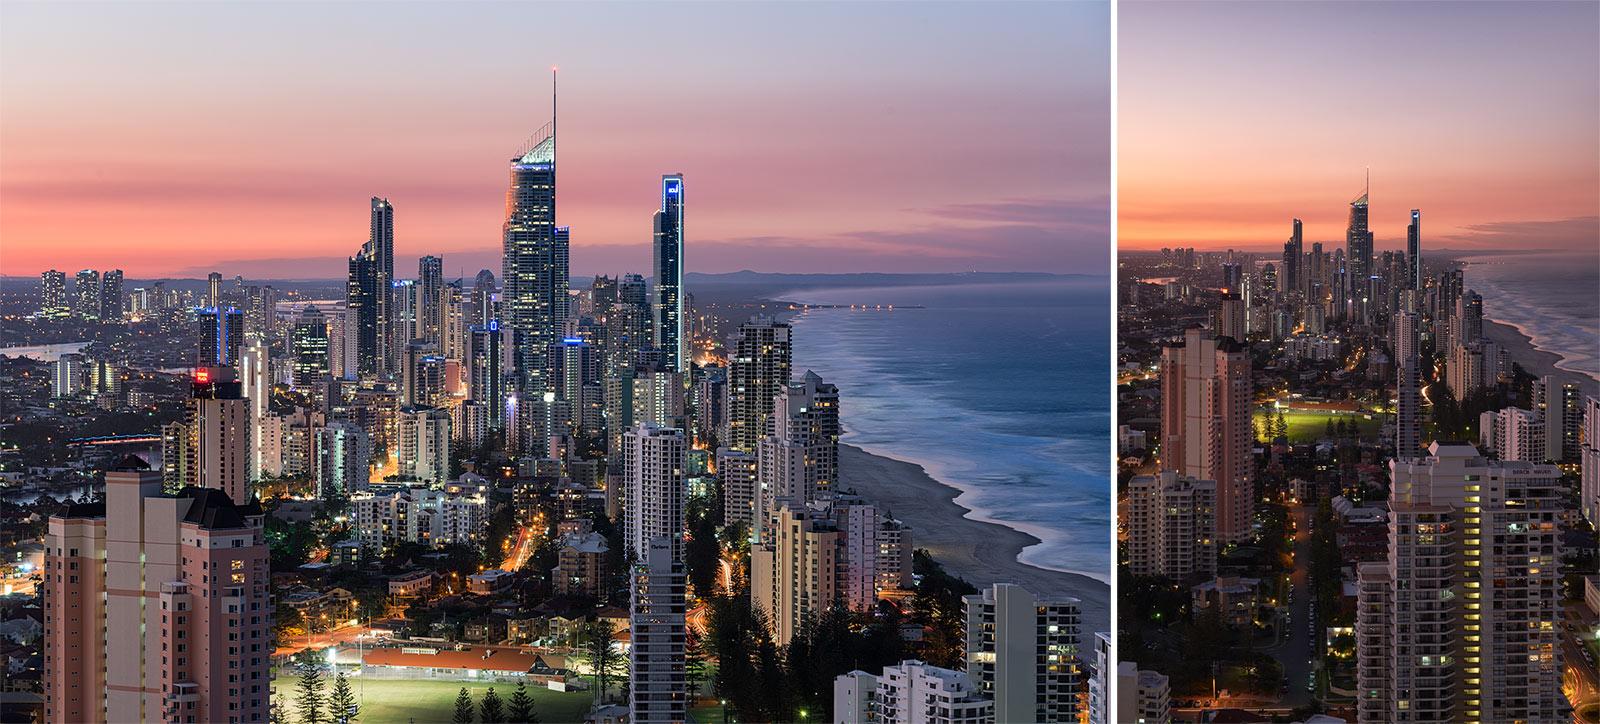 Left: Nikon D800 Image | Right: Fujifilm X-T1 Image